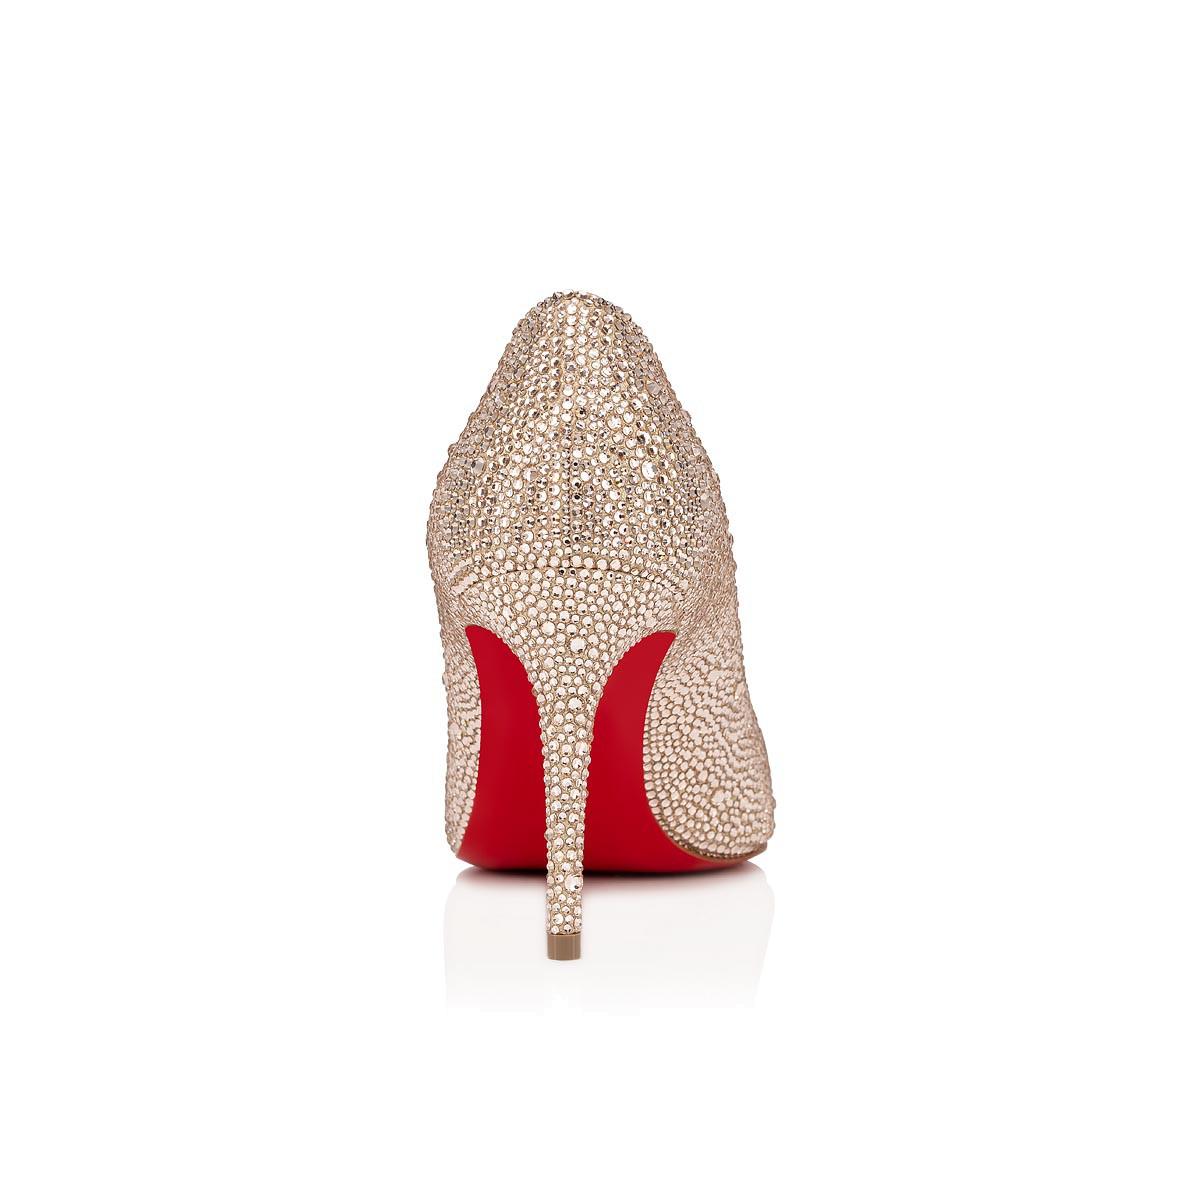 鞋履 - Kate Strass Strass - Christian Louboutin